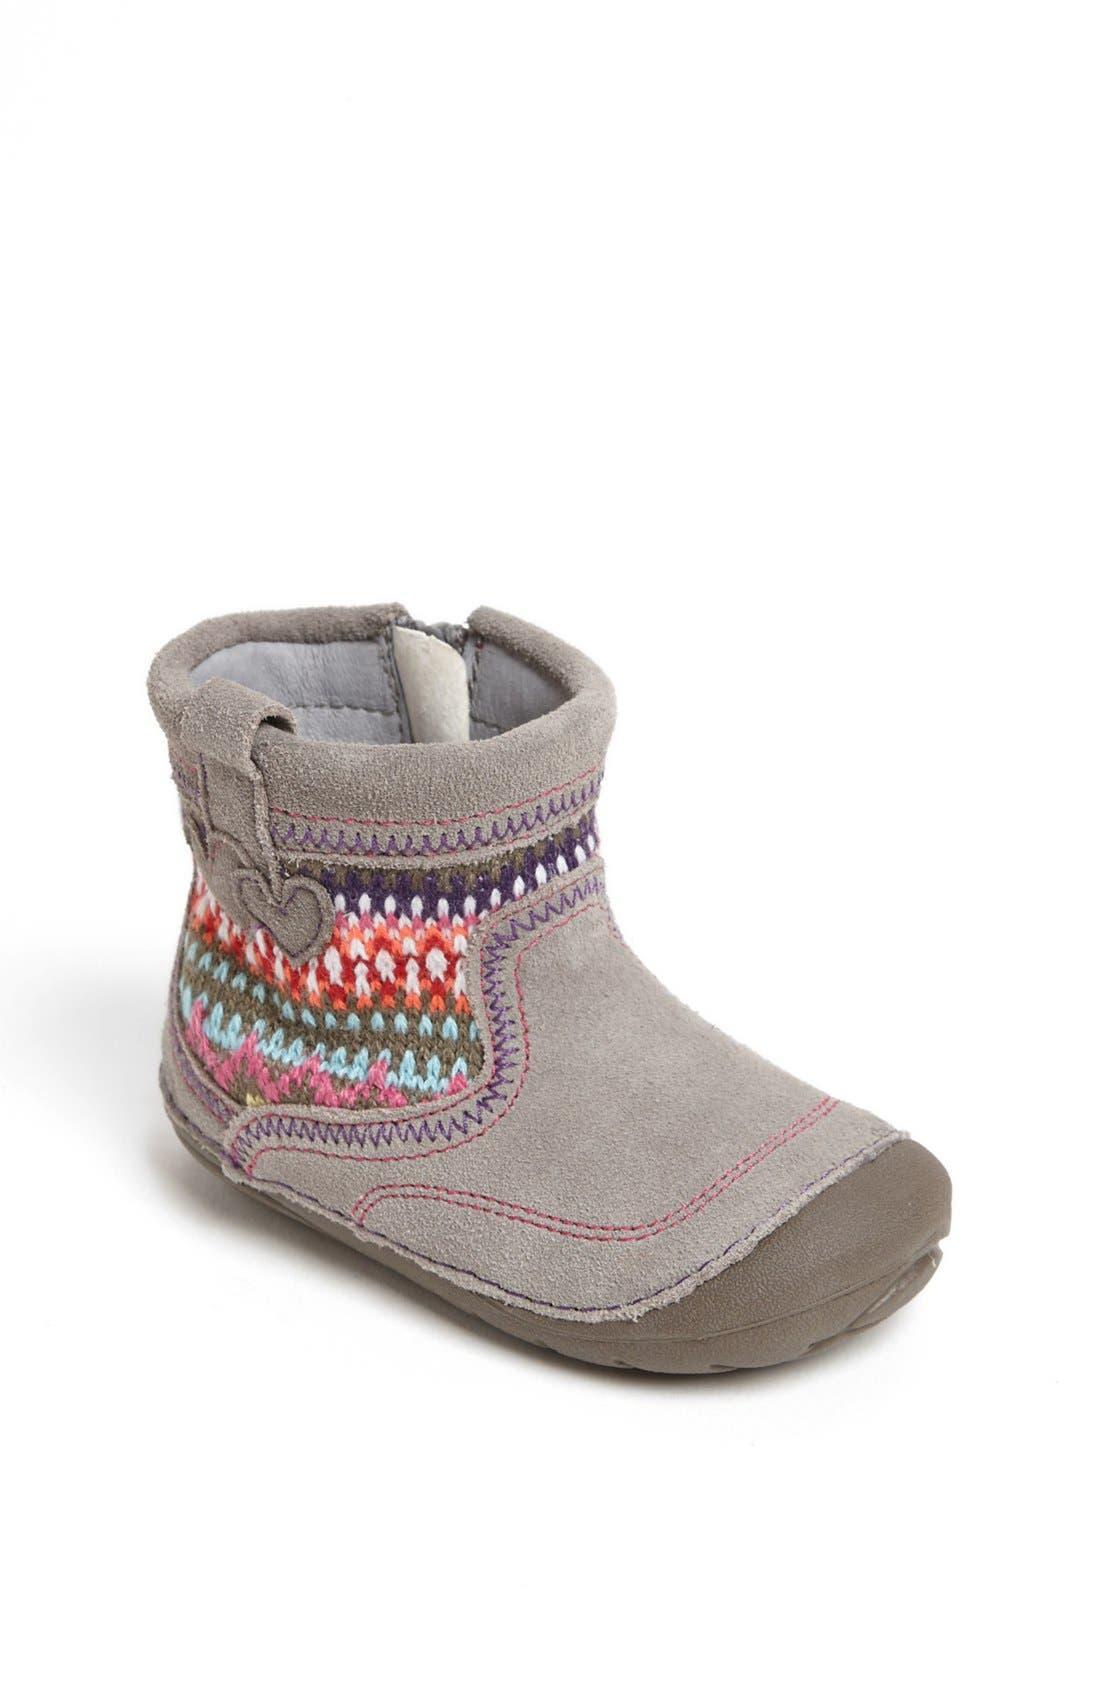 Main Image - Stride Rite 'SRT Ainsley' Boot (Baby & Walker)